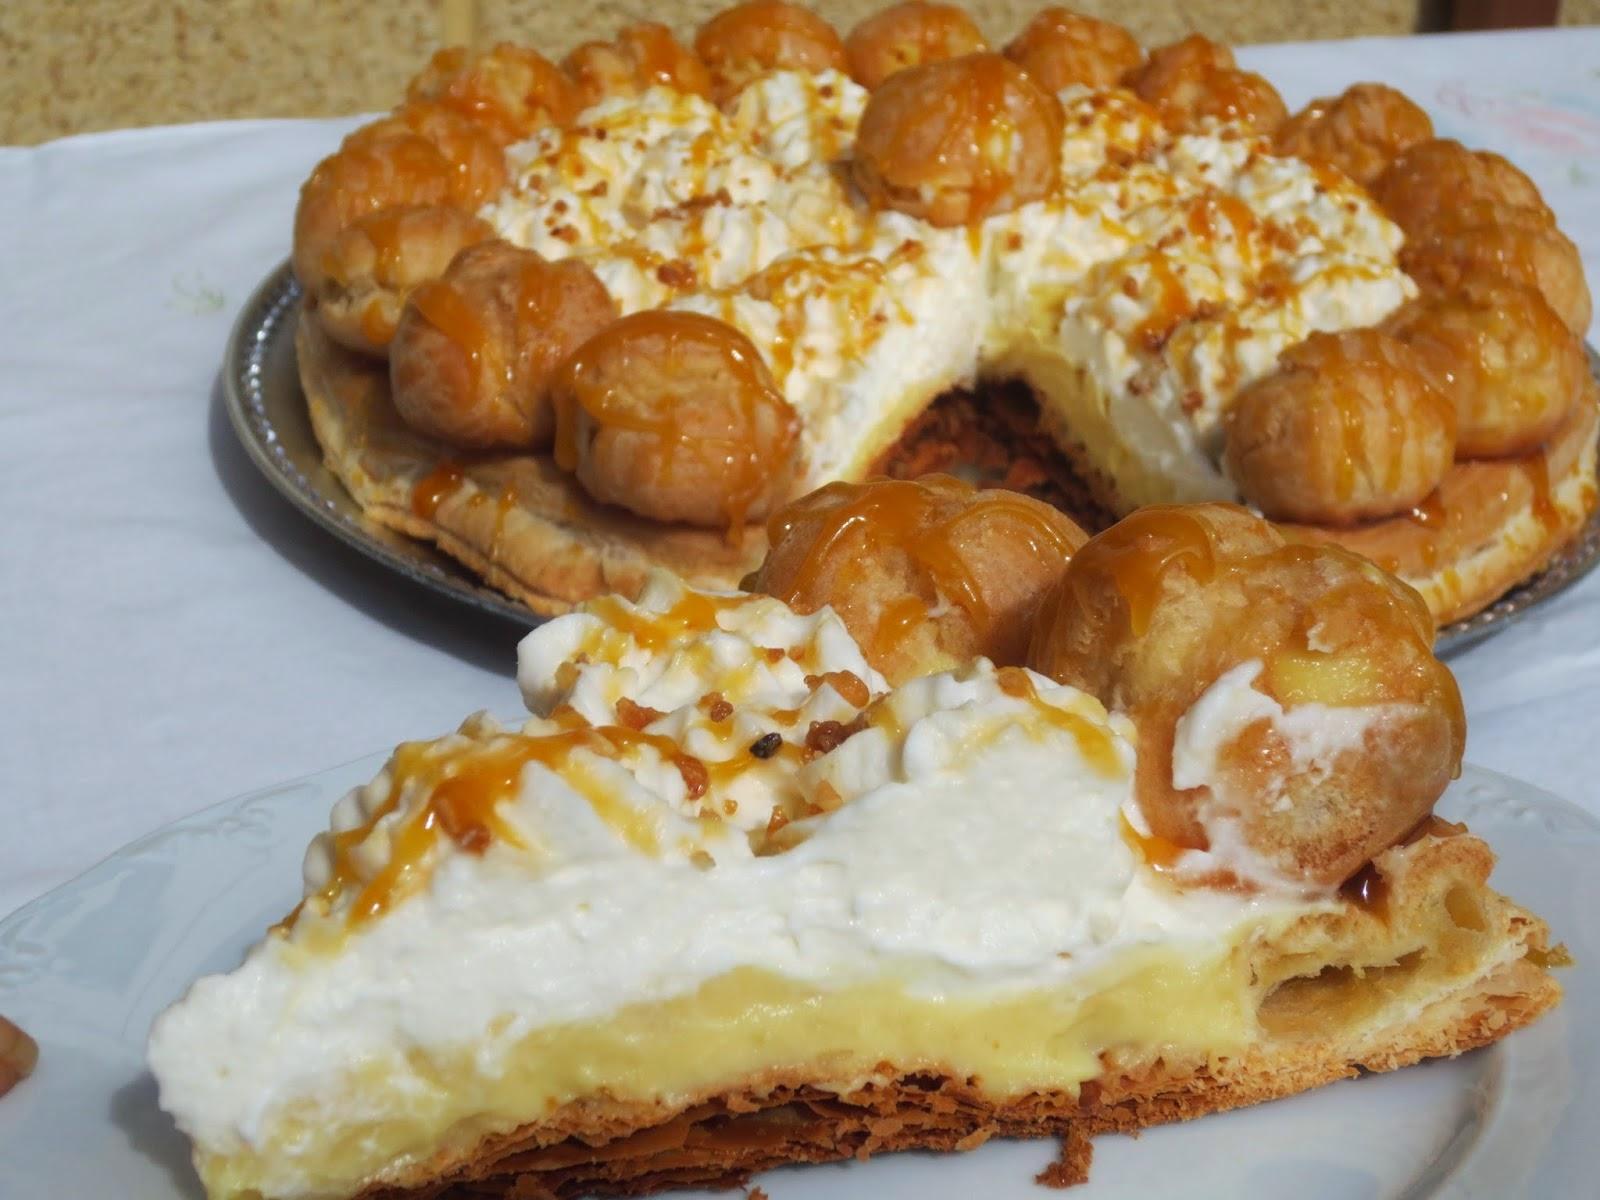 Pastel Saint-Honoré Ana Sevilla cocina tradicional